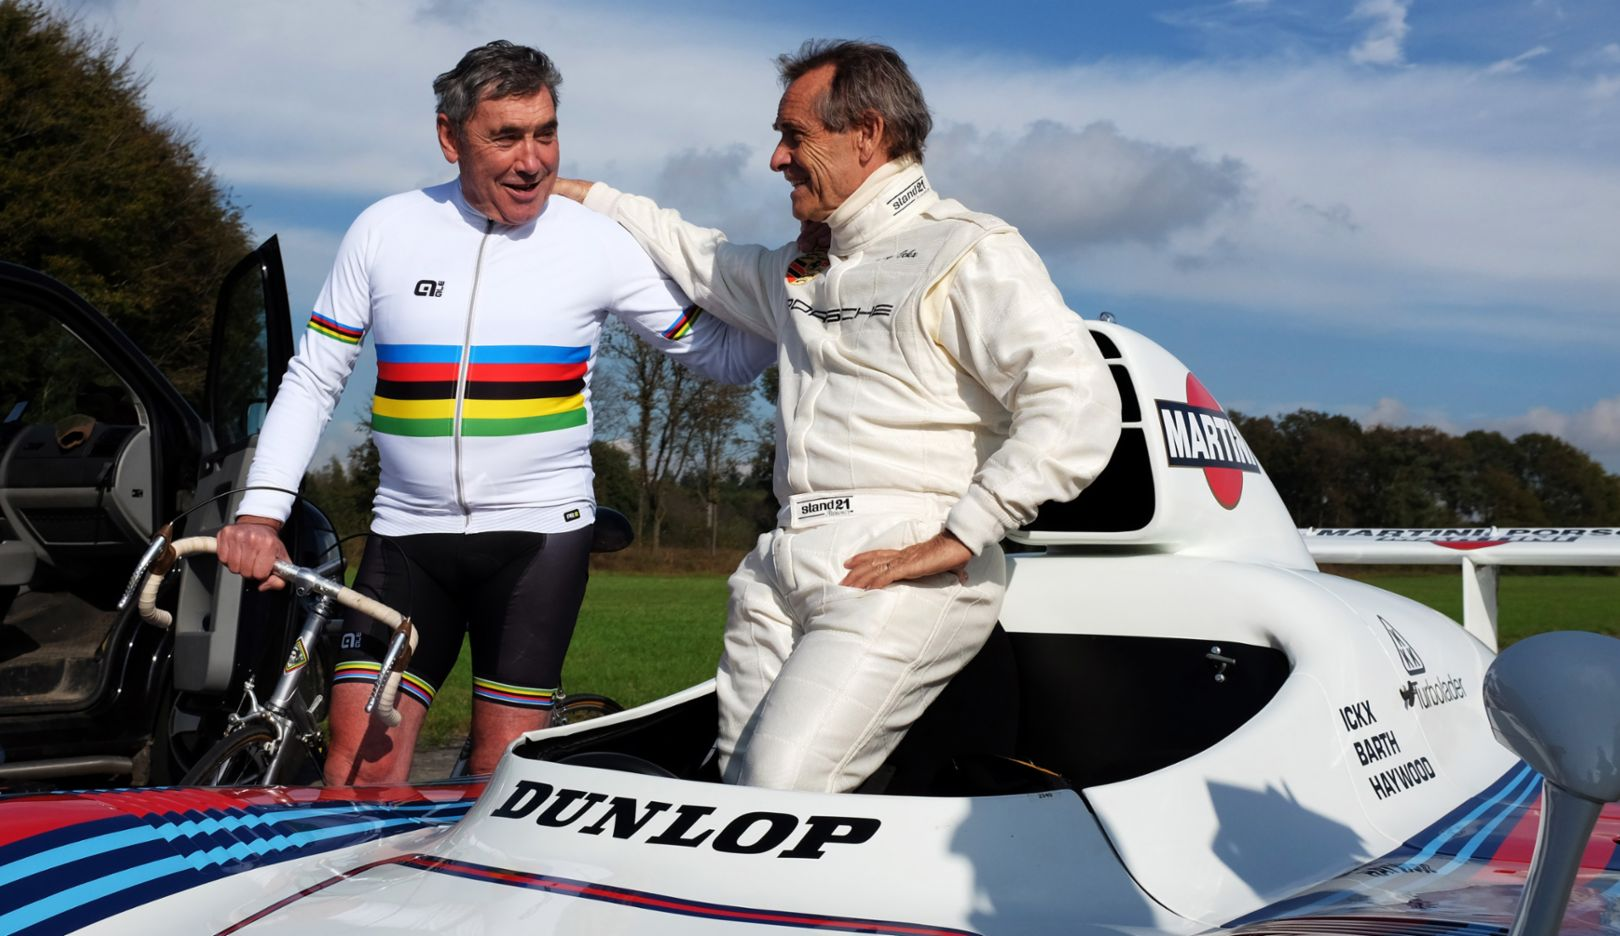 Eddy Merckx, former professional racing cyclist , Jacky Ickx, former Porsche race driver, 2015, Porsche AG